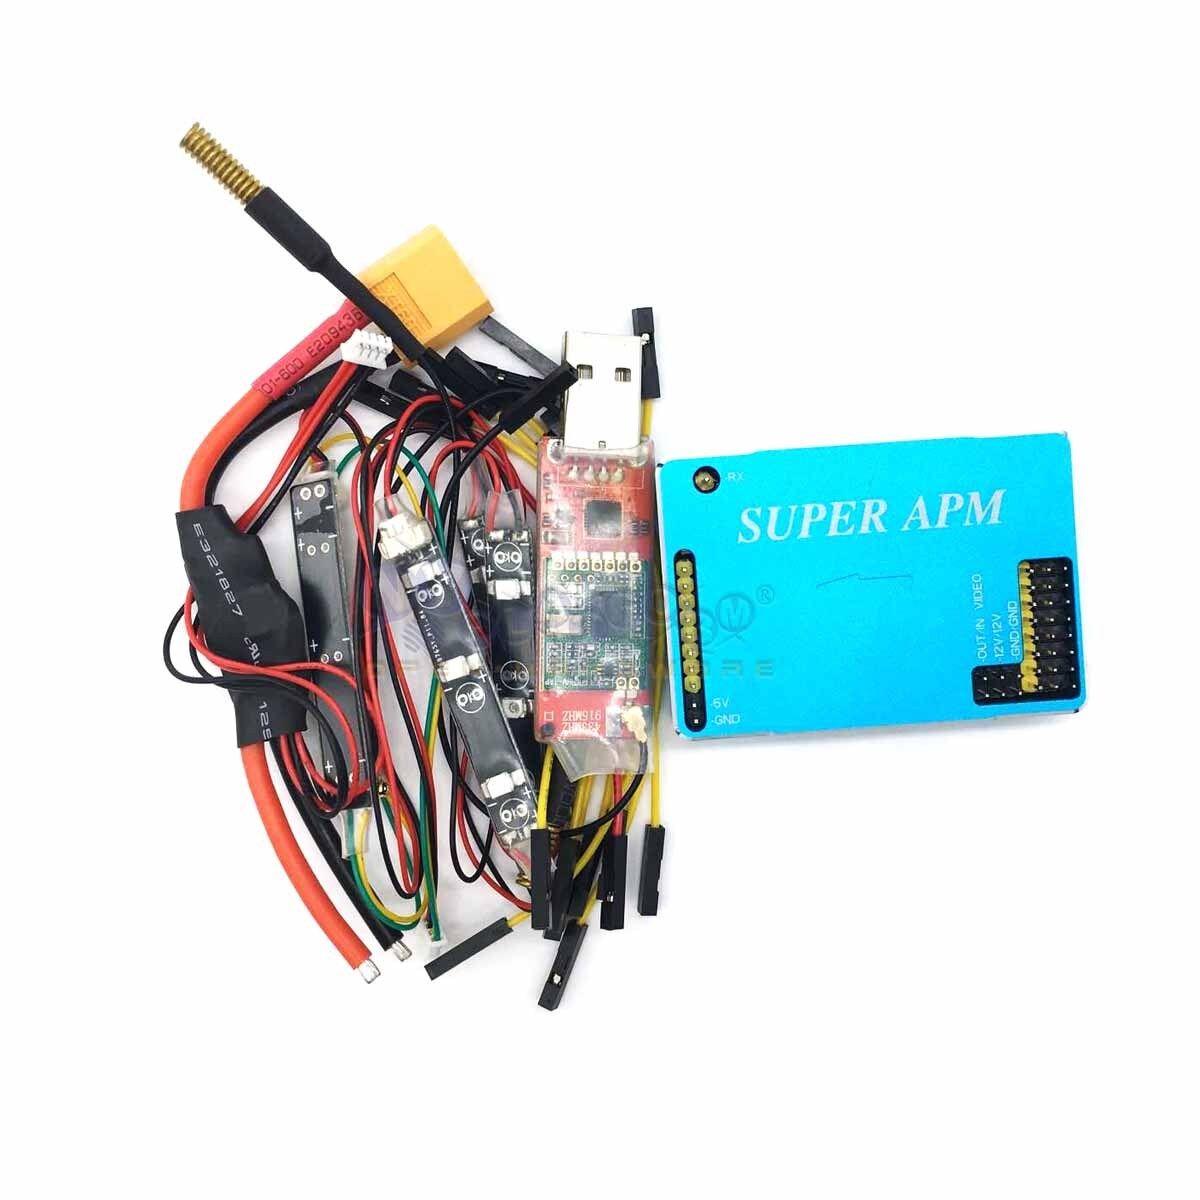 915Mhz SUPER  APM volo Controller Autopilot integrated OSD Telemetry Sensor  grandi risparmi